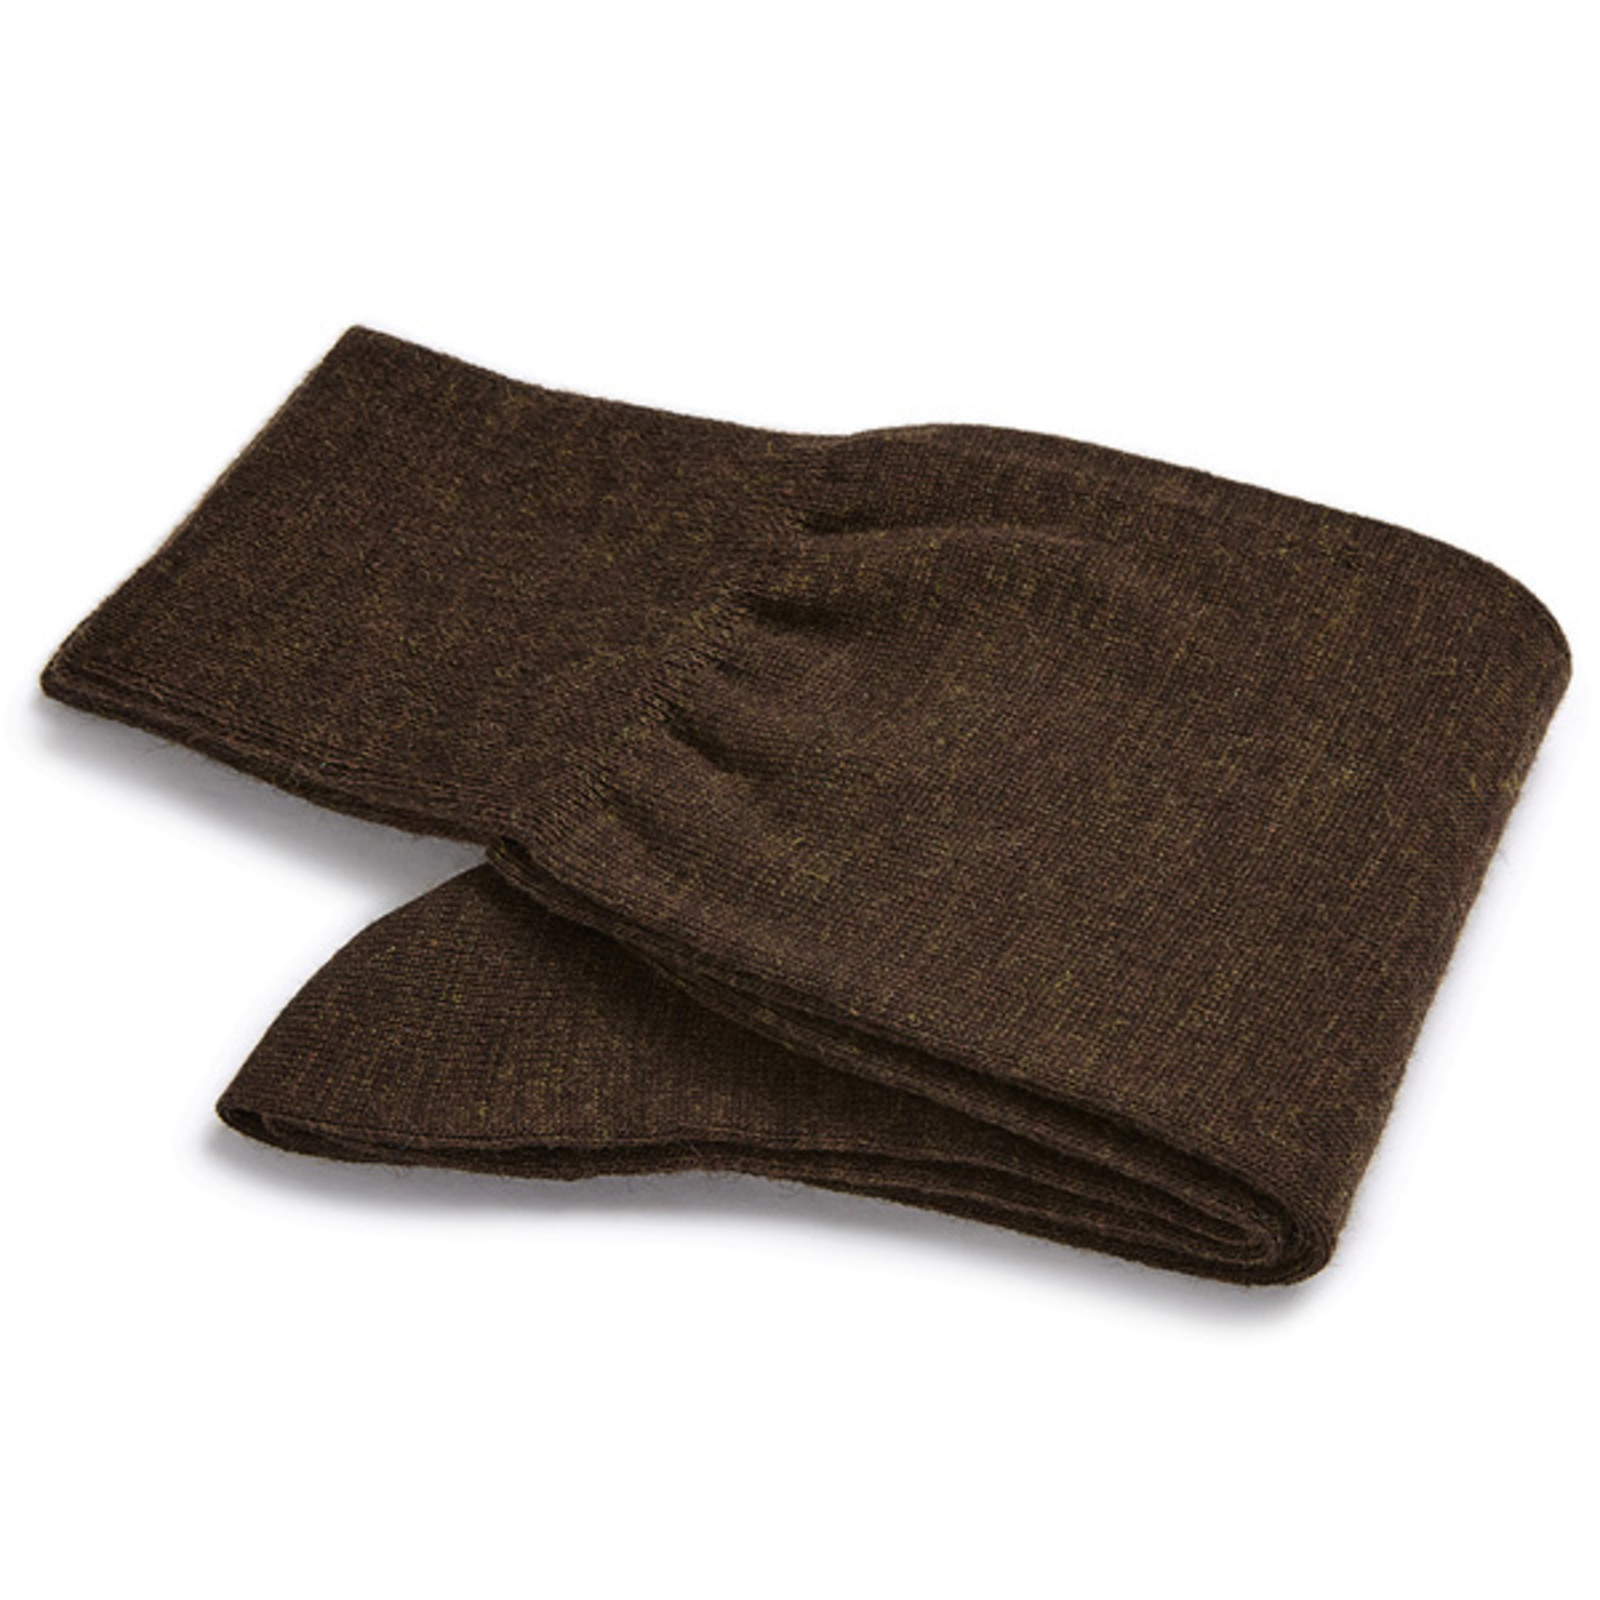 Carlo Lanza Braune Merino Wolle Socken